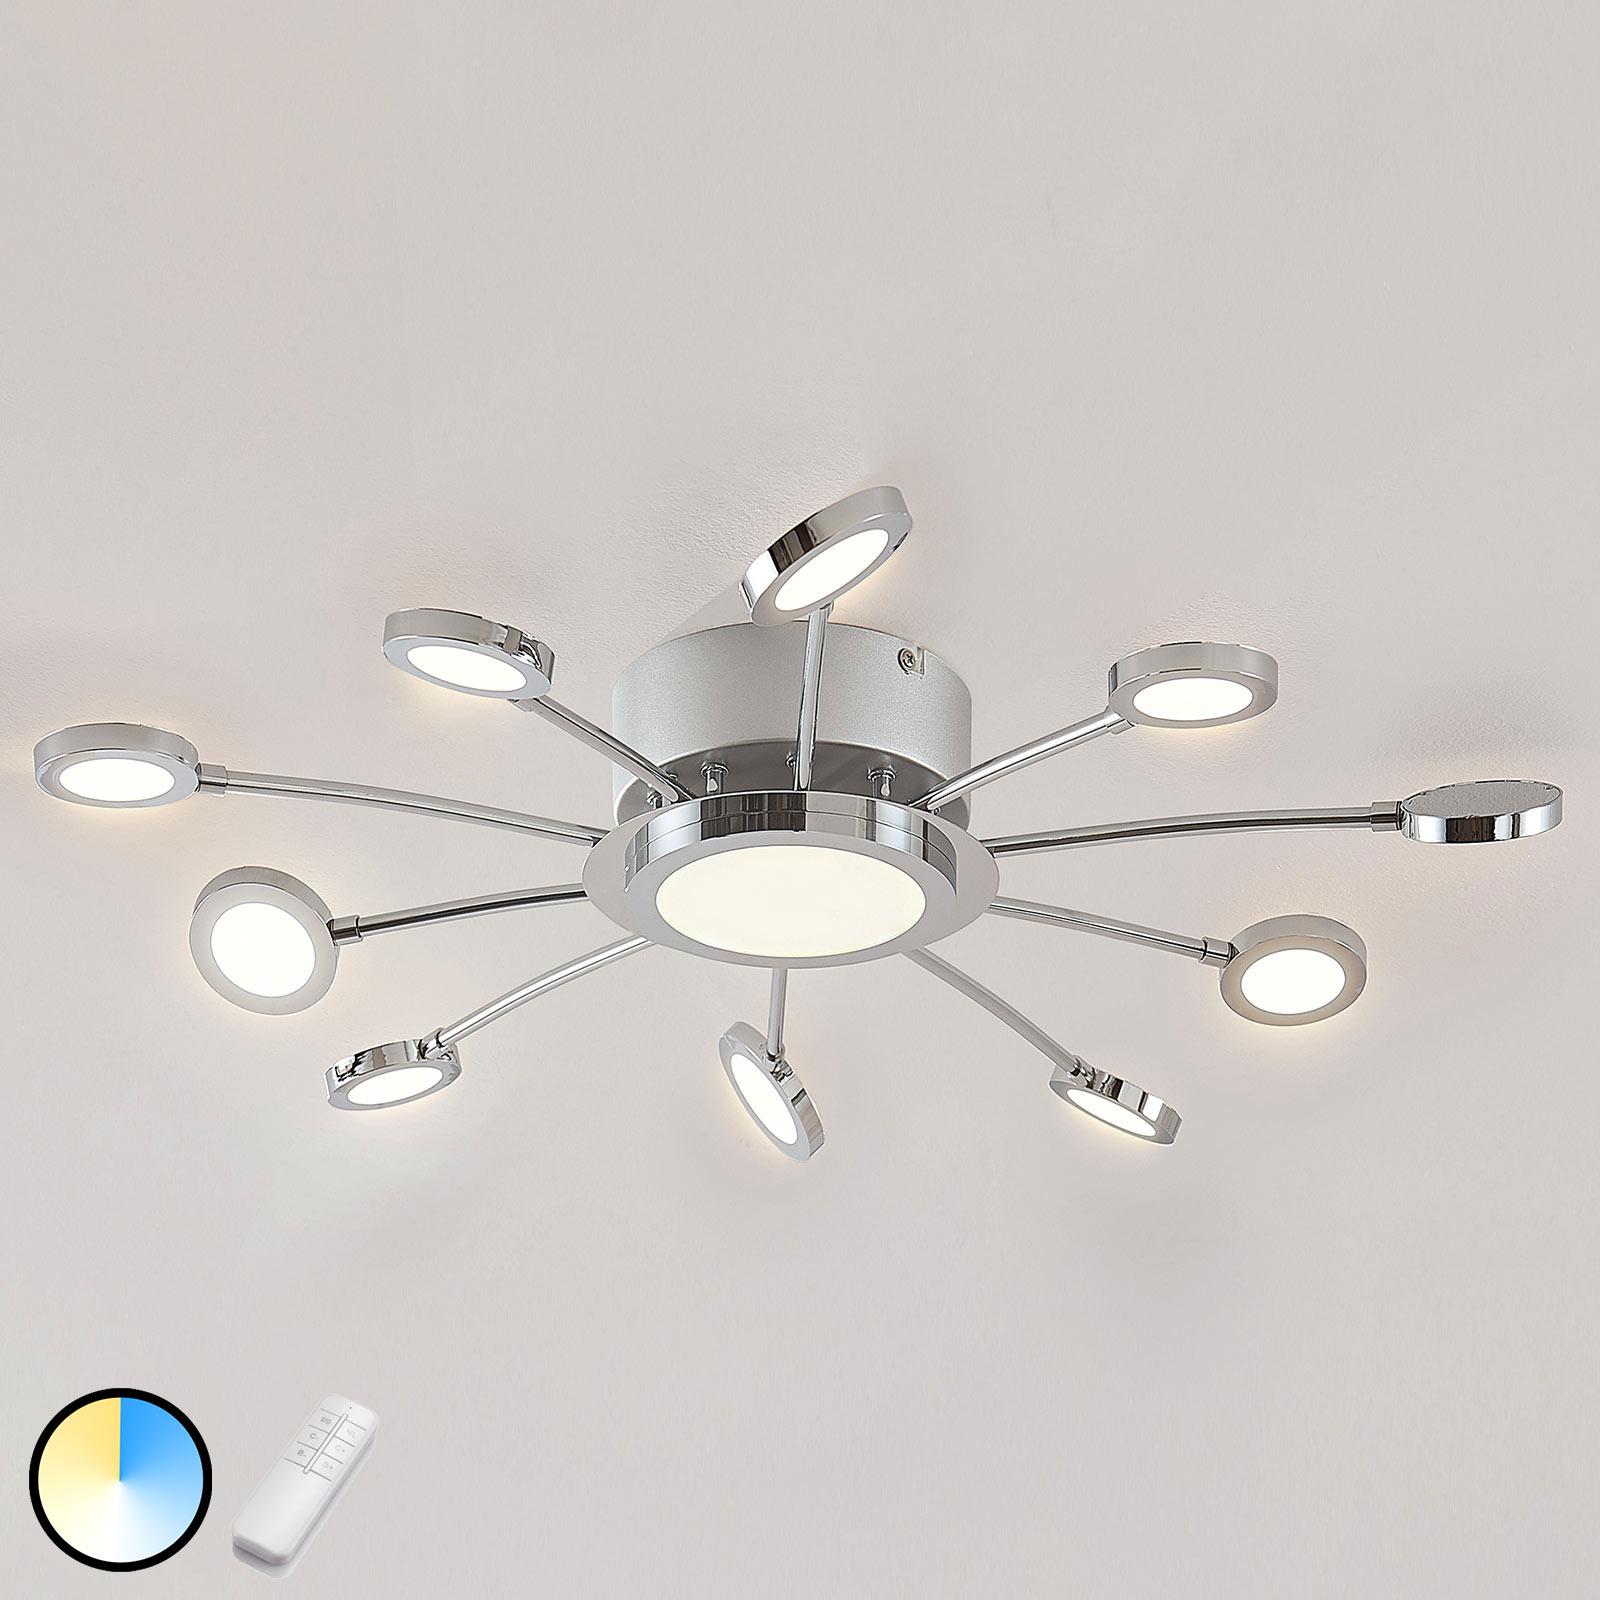 Chromowana lampa sufitowa LED Meru, zmienna barwa